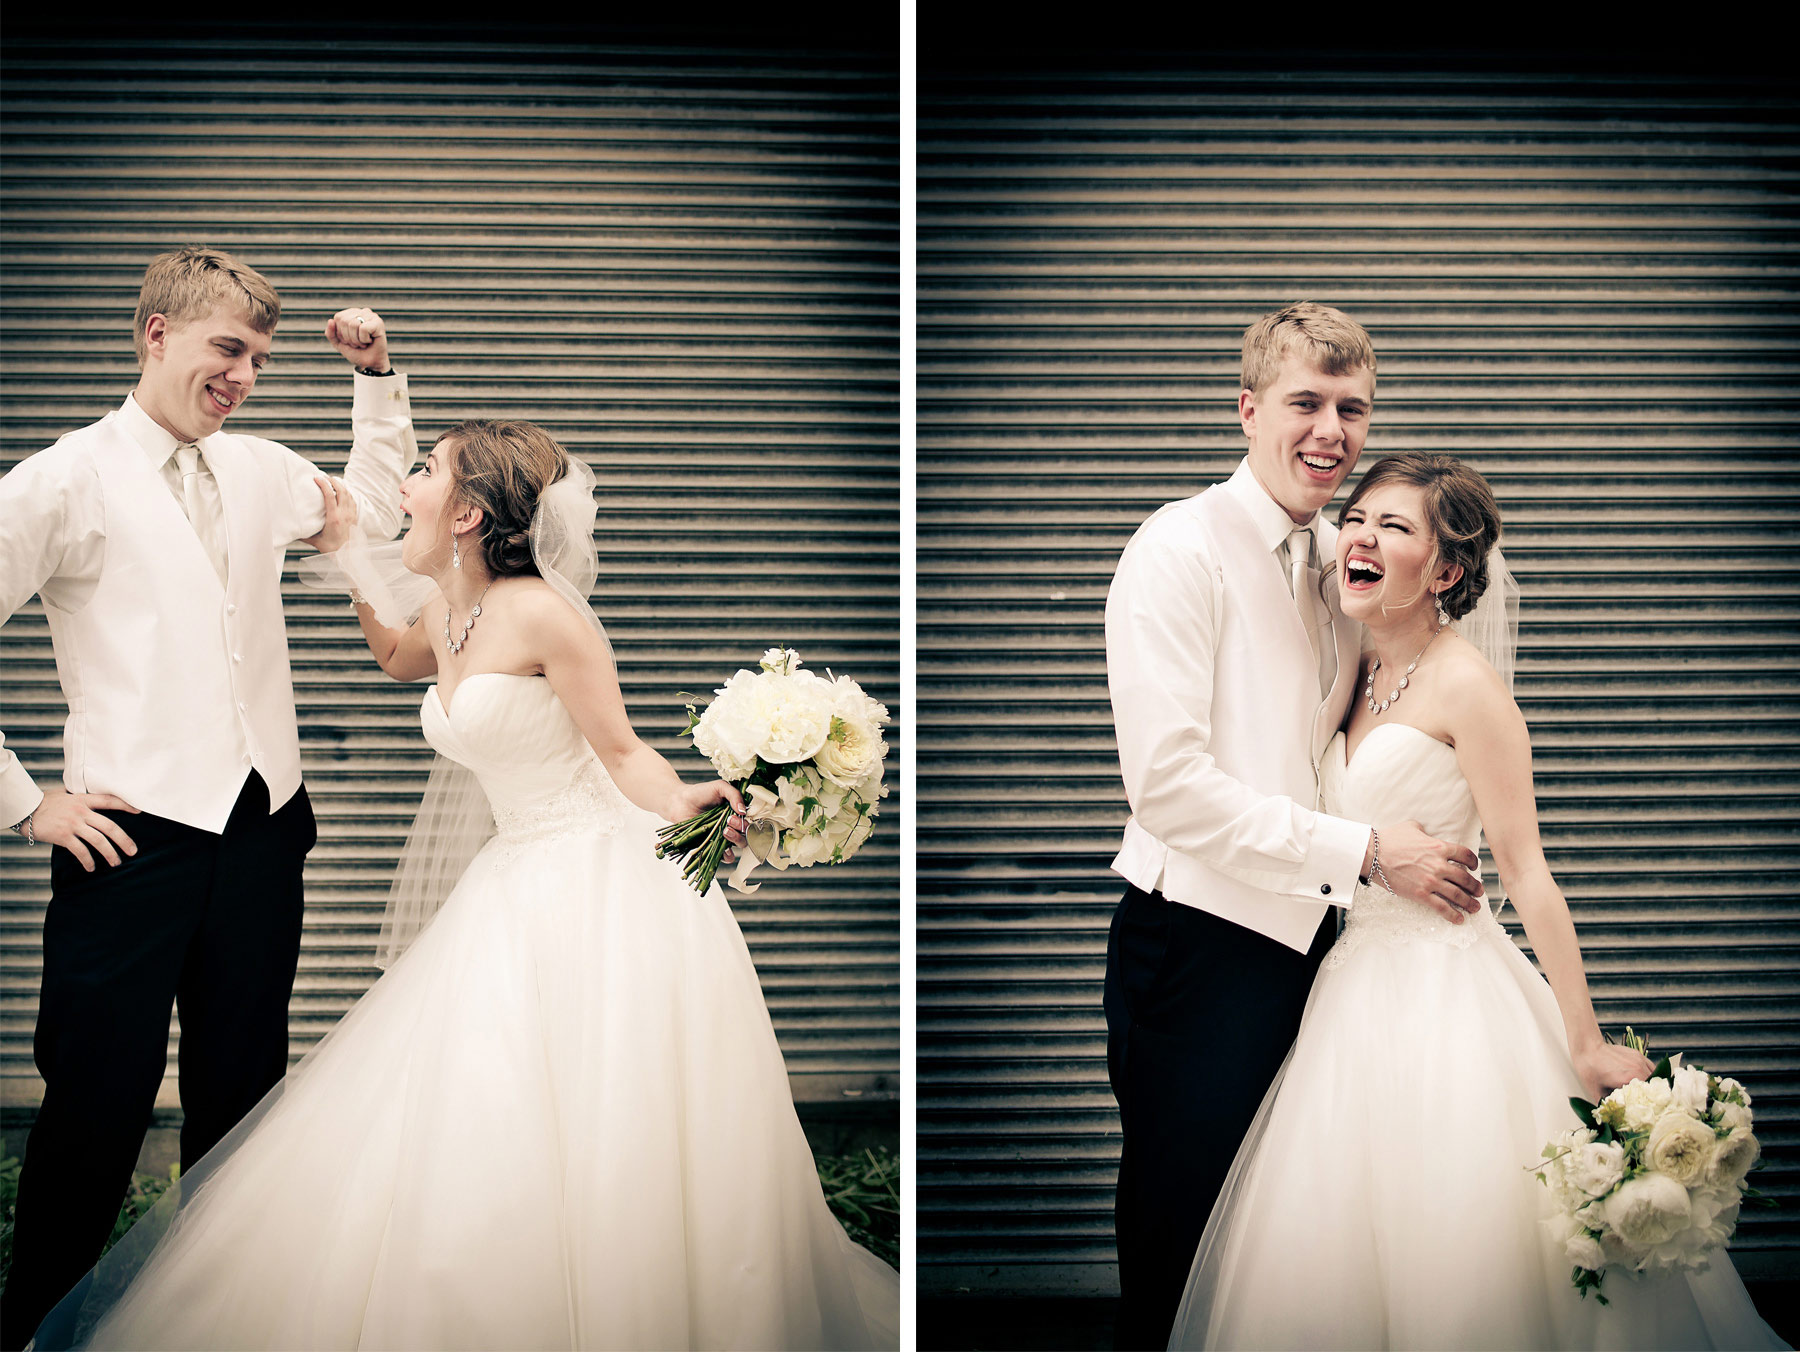 06-Minneapolis-Minnesota-Wedding-Photography-by-Vick-Photography-Courtney-&-John.jpg